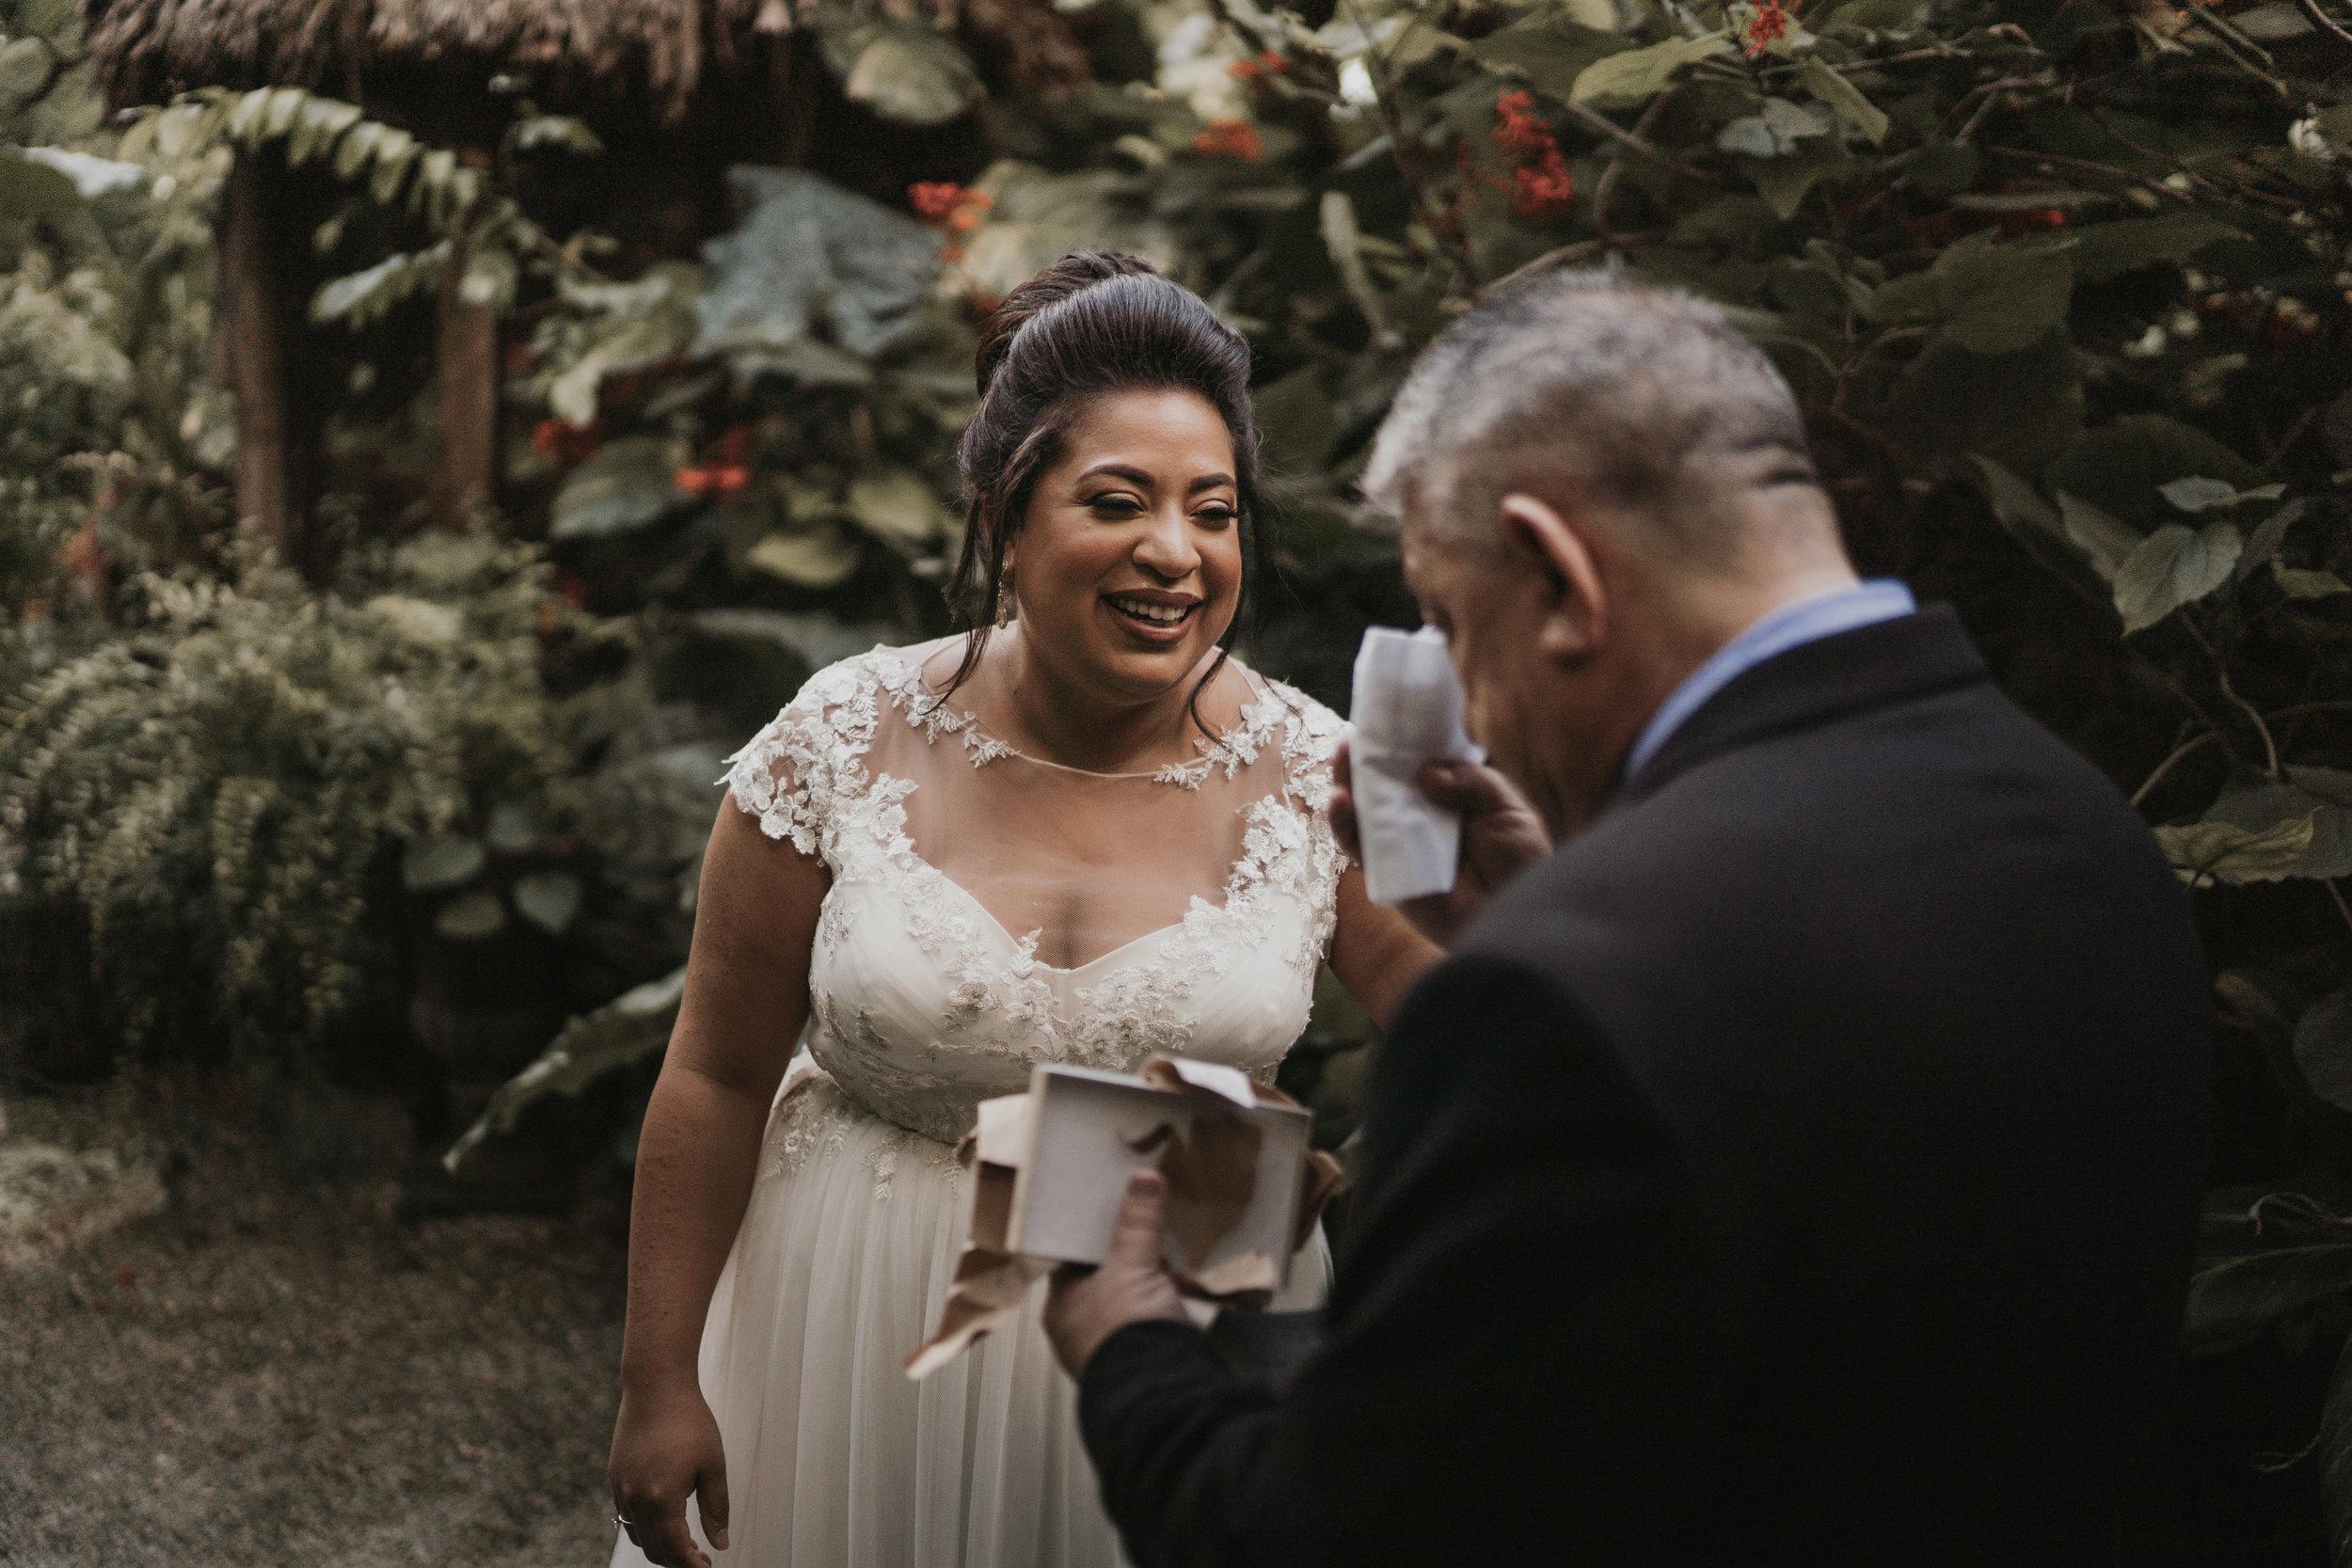 244MICHI&GABEWEDDINGDAY(WeddingFinal).jpg